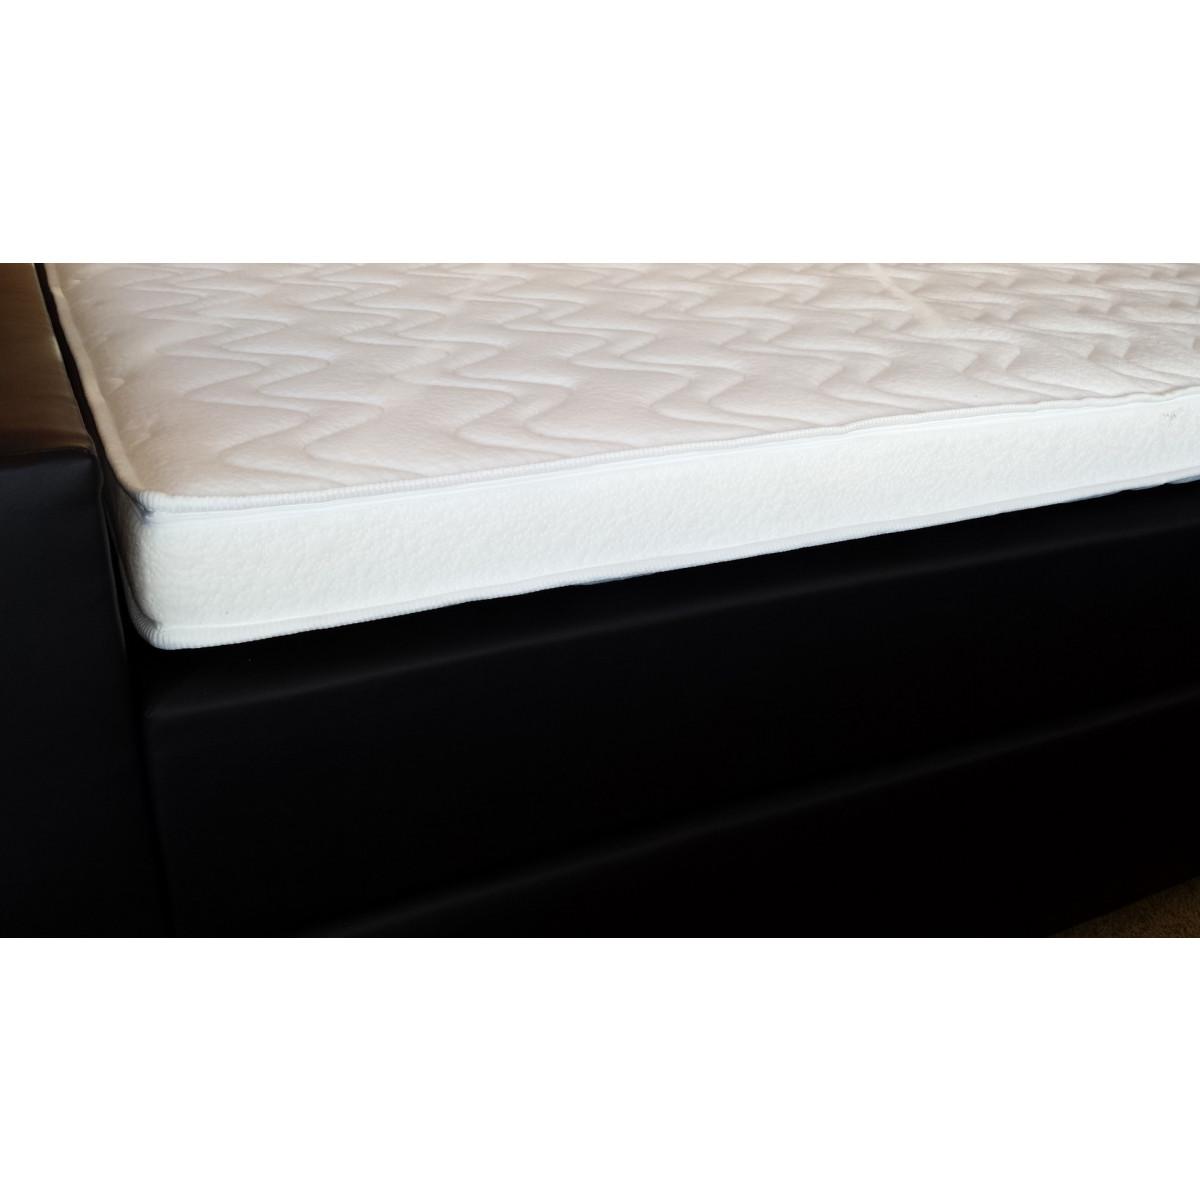 Scänfort topmatras latex 9cm